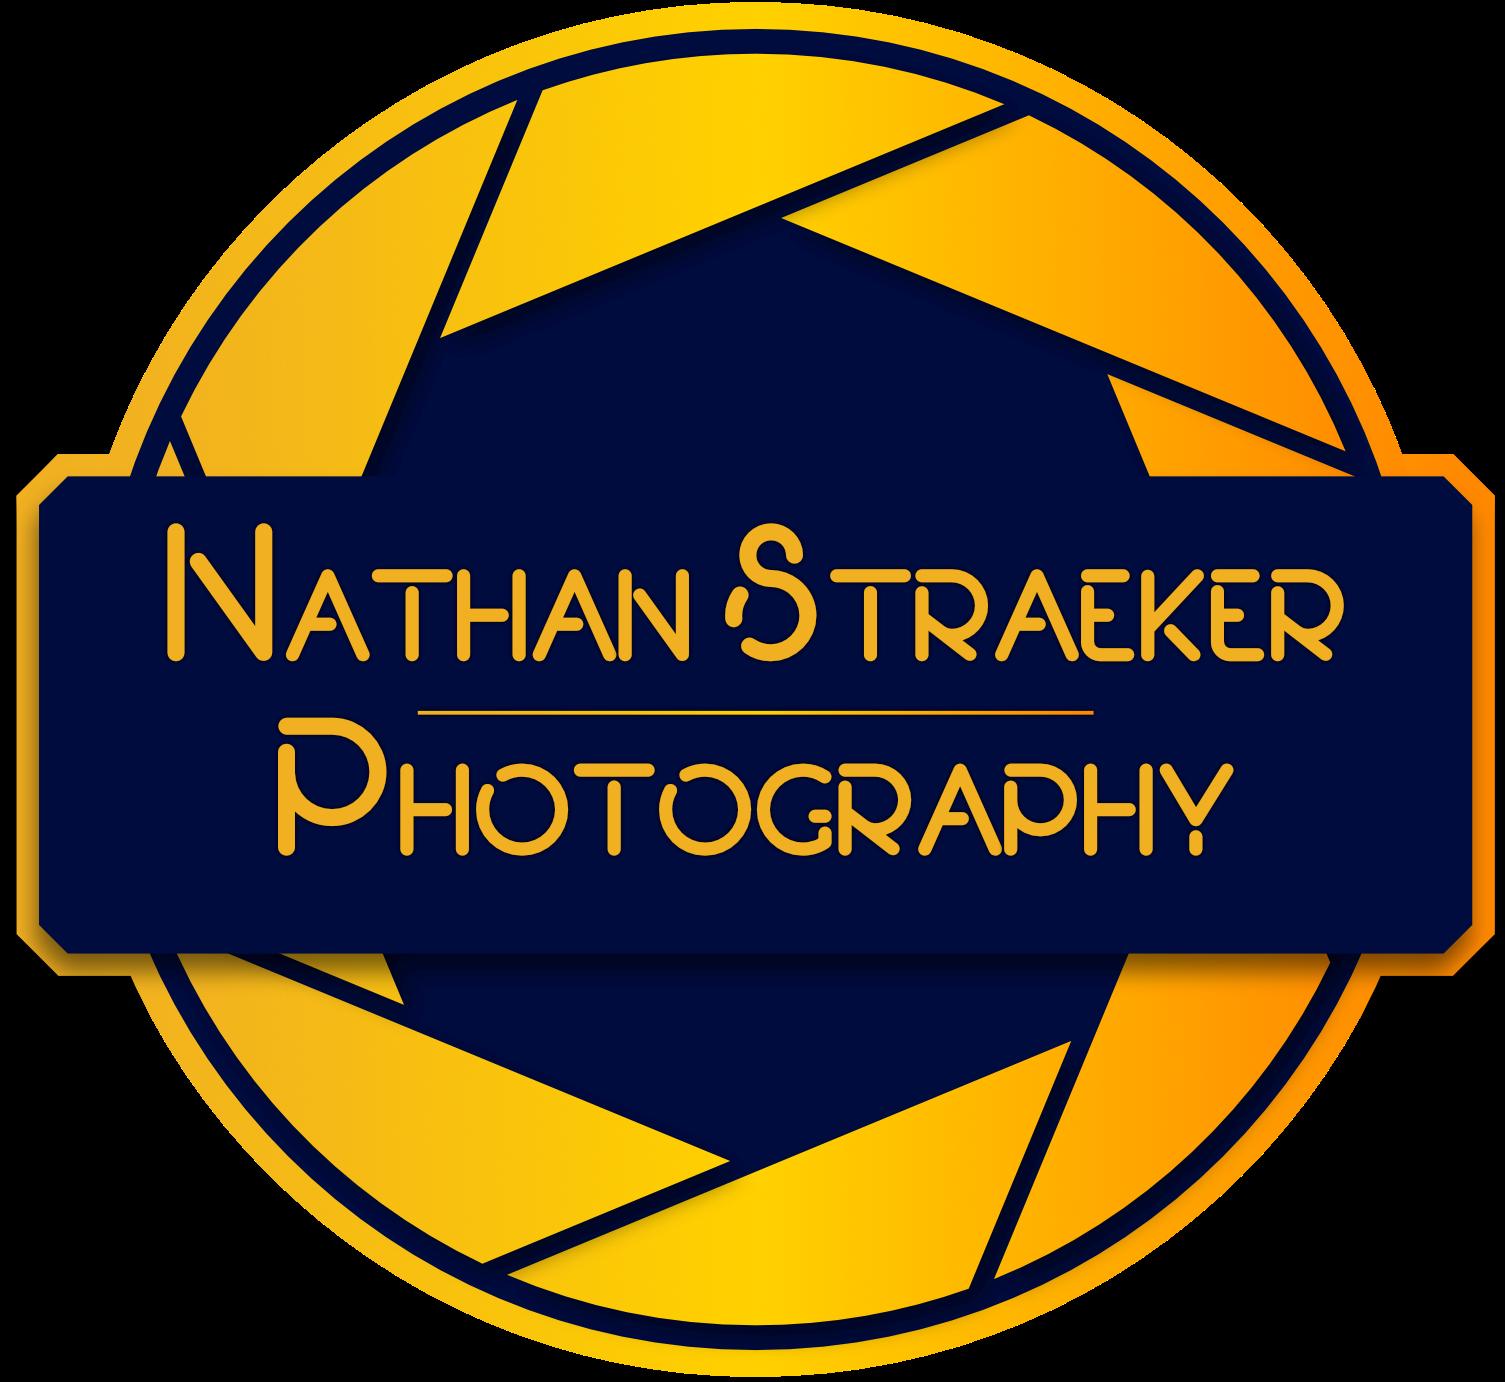 Nathan Straeker Photography